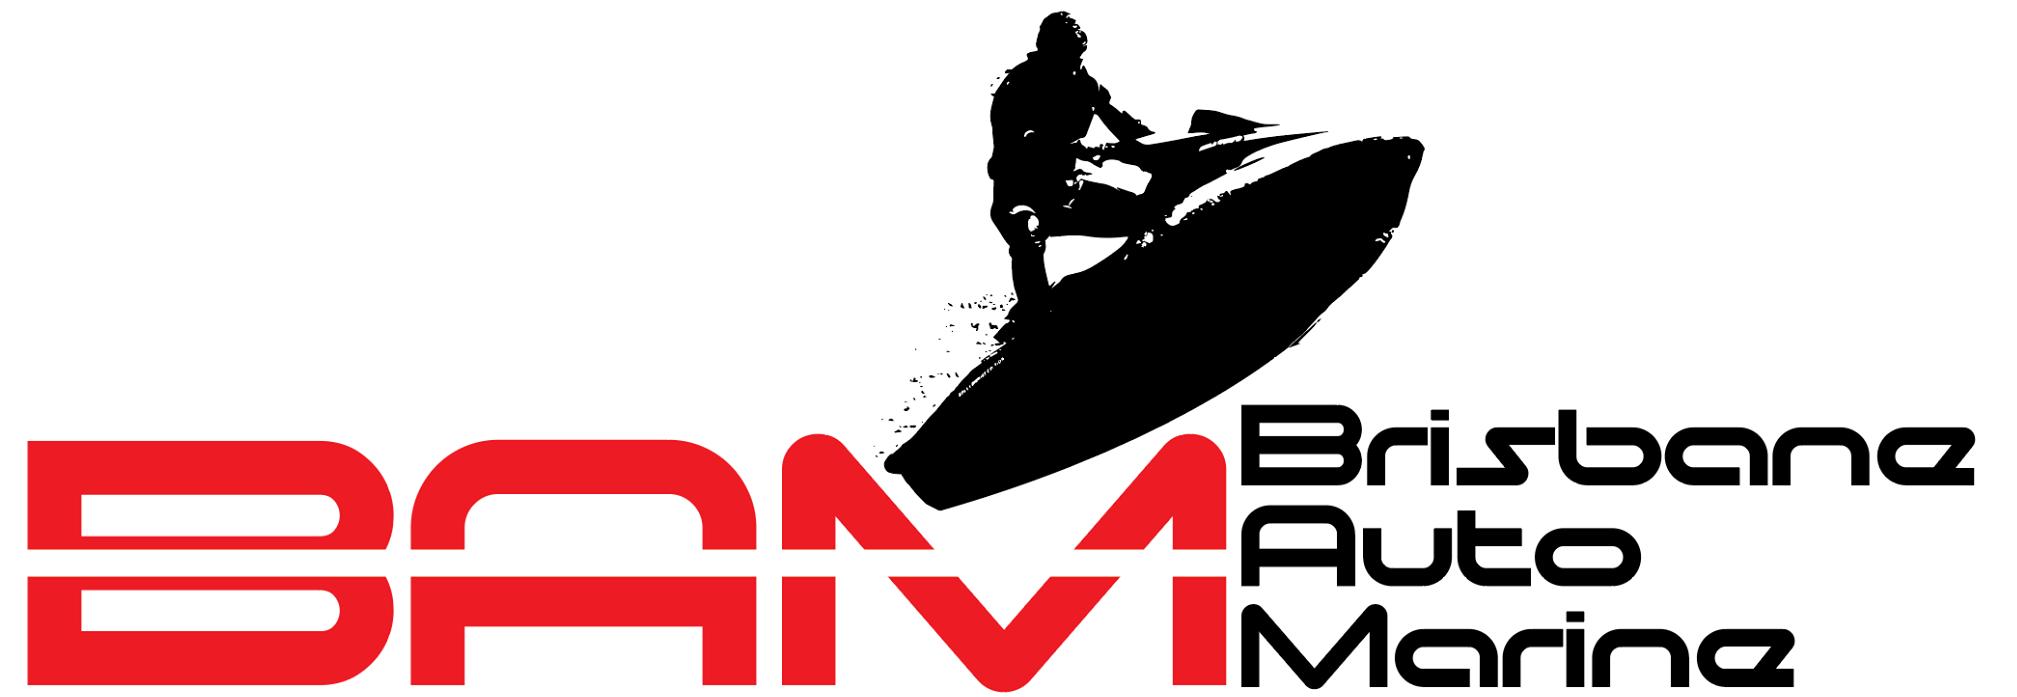 Brisbane Auto Marine Logo